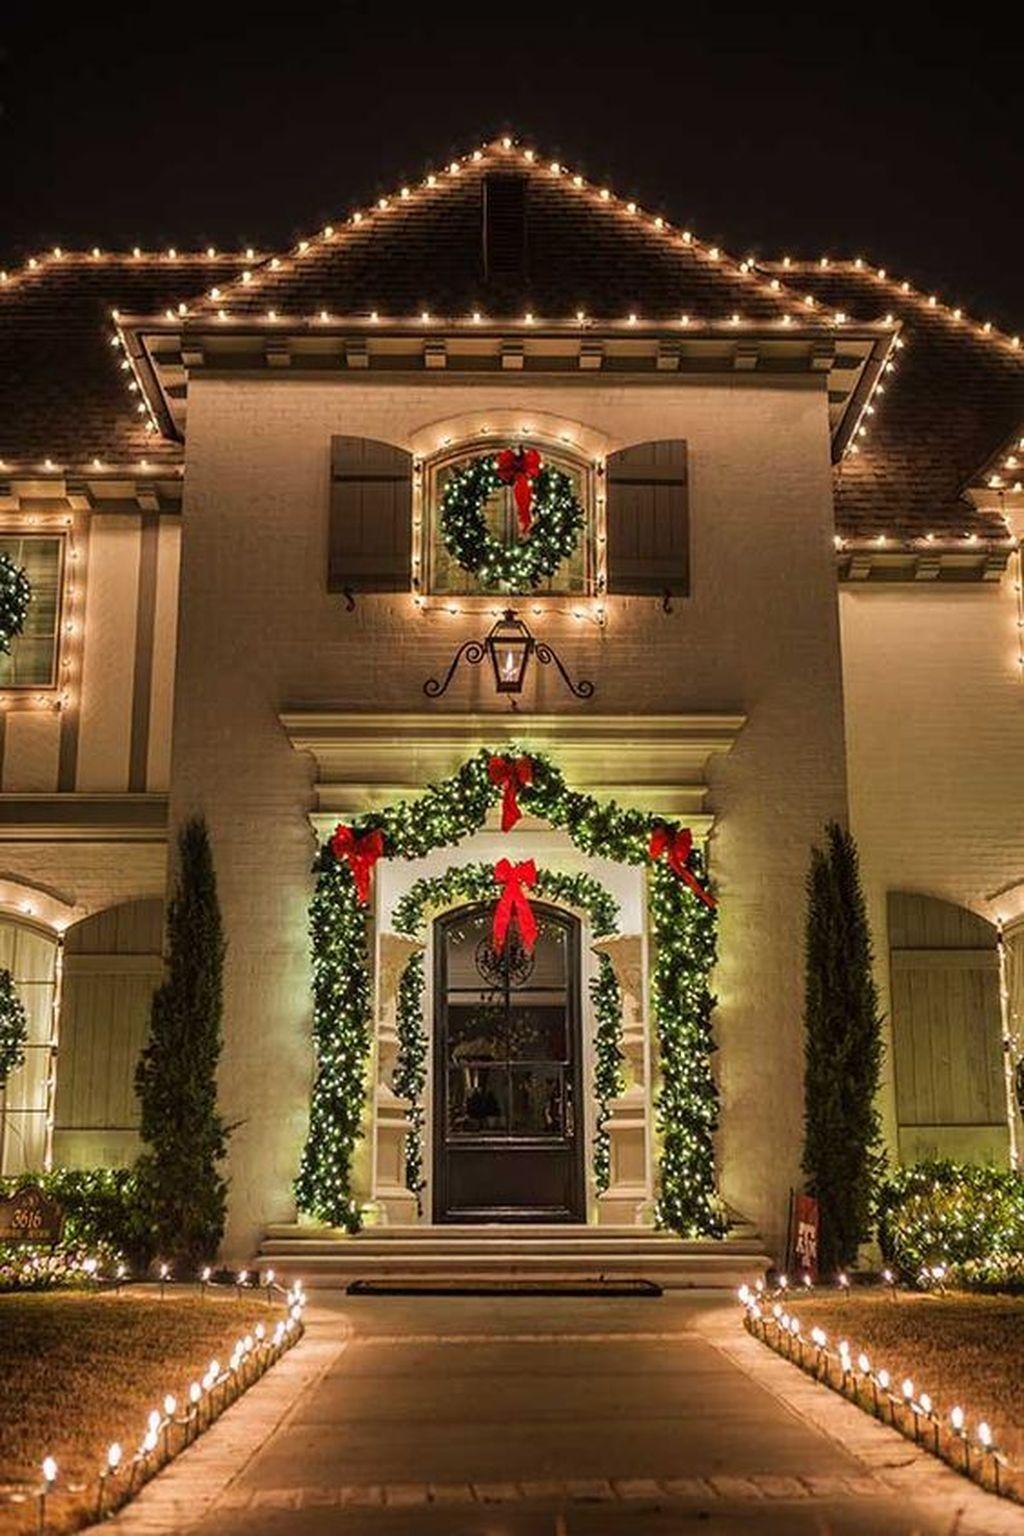 Stunning Christmas Lights For Exterior Decor Outside Christmas Decorations Exterior Christmas Lights Decorating With Christmas Lights